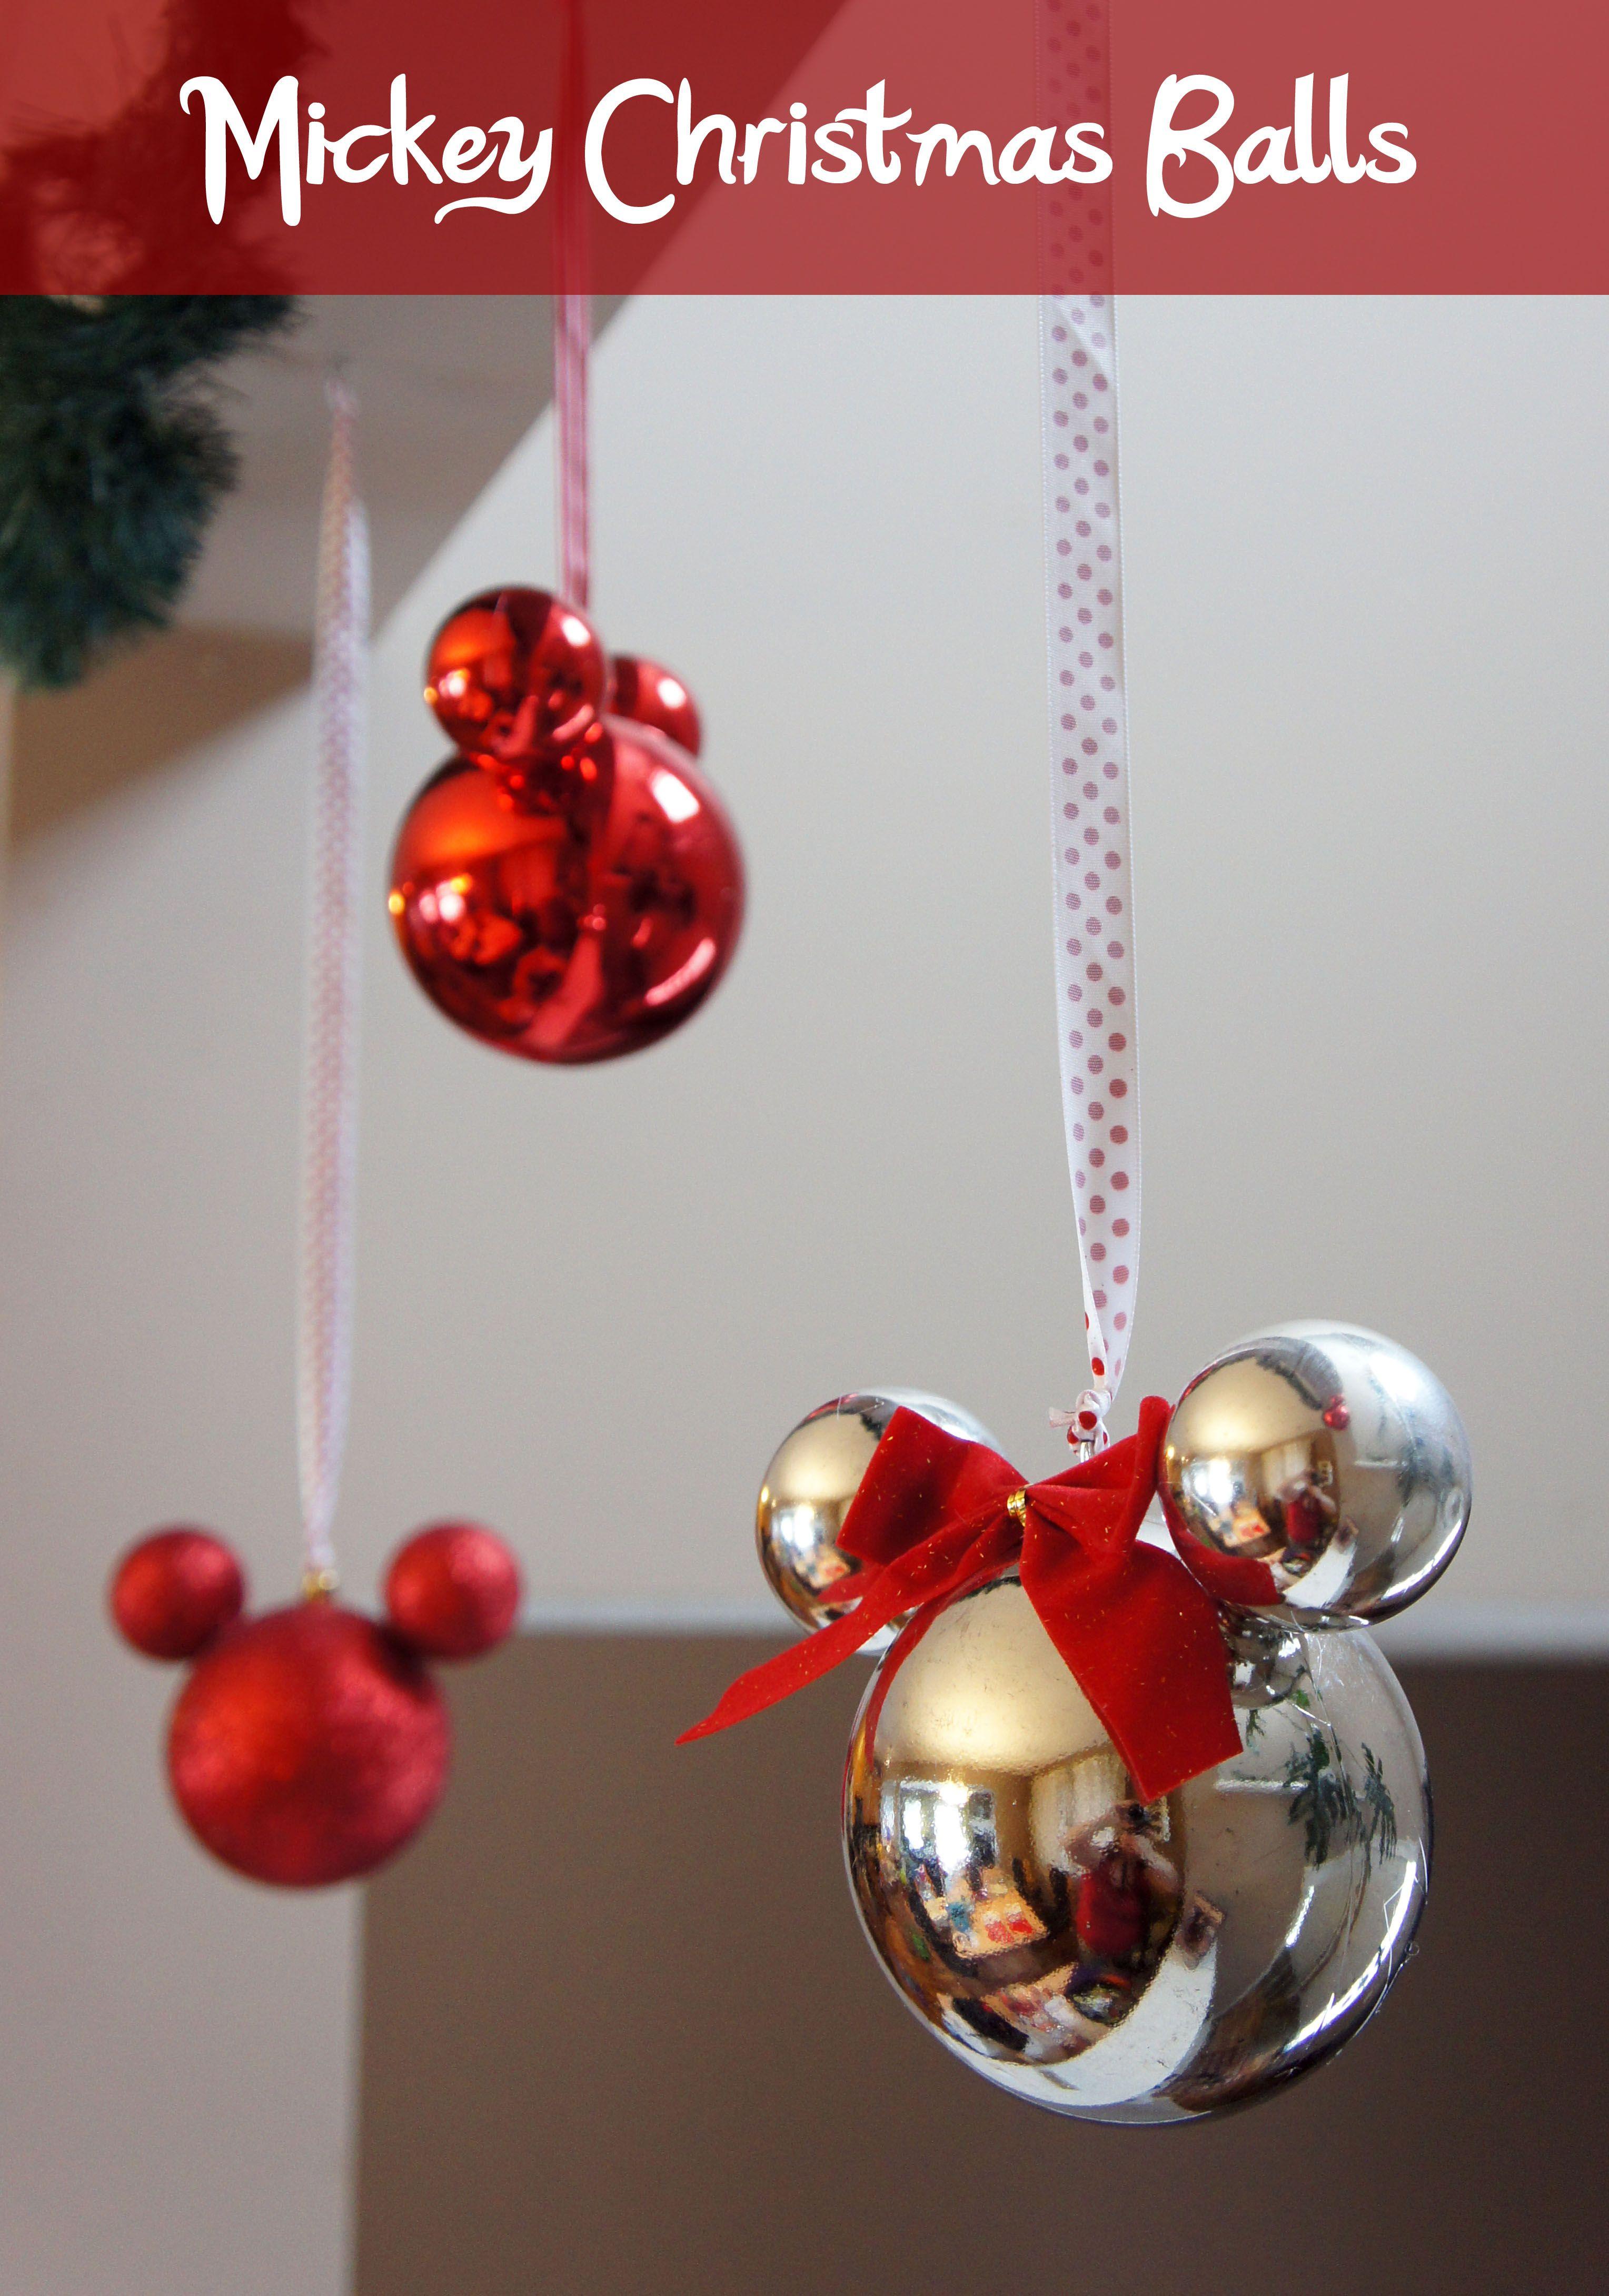 We Ve Got Ears Mickey Christmas Balls Disney Christmas Ornaments Mickey Christmas Disney Christmas Decorations